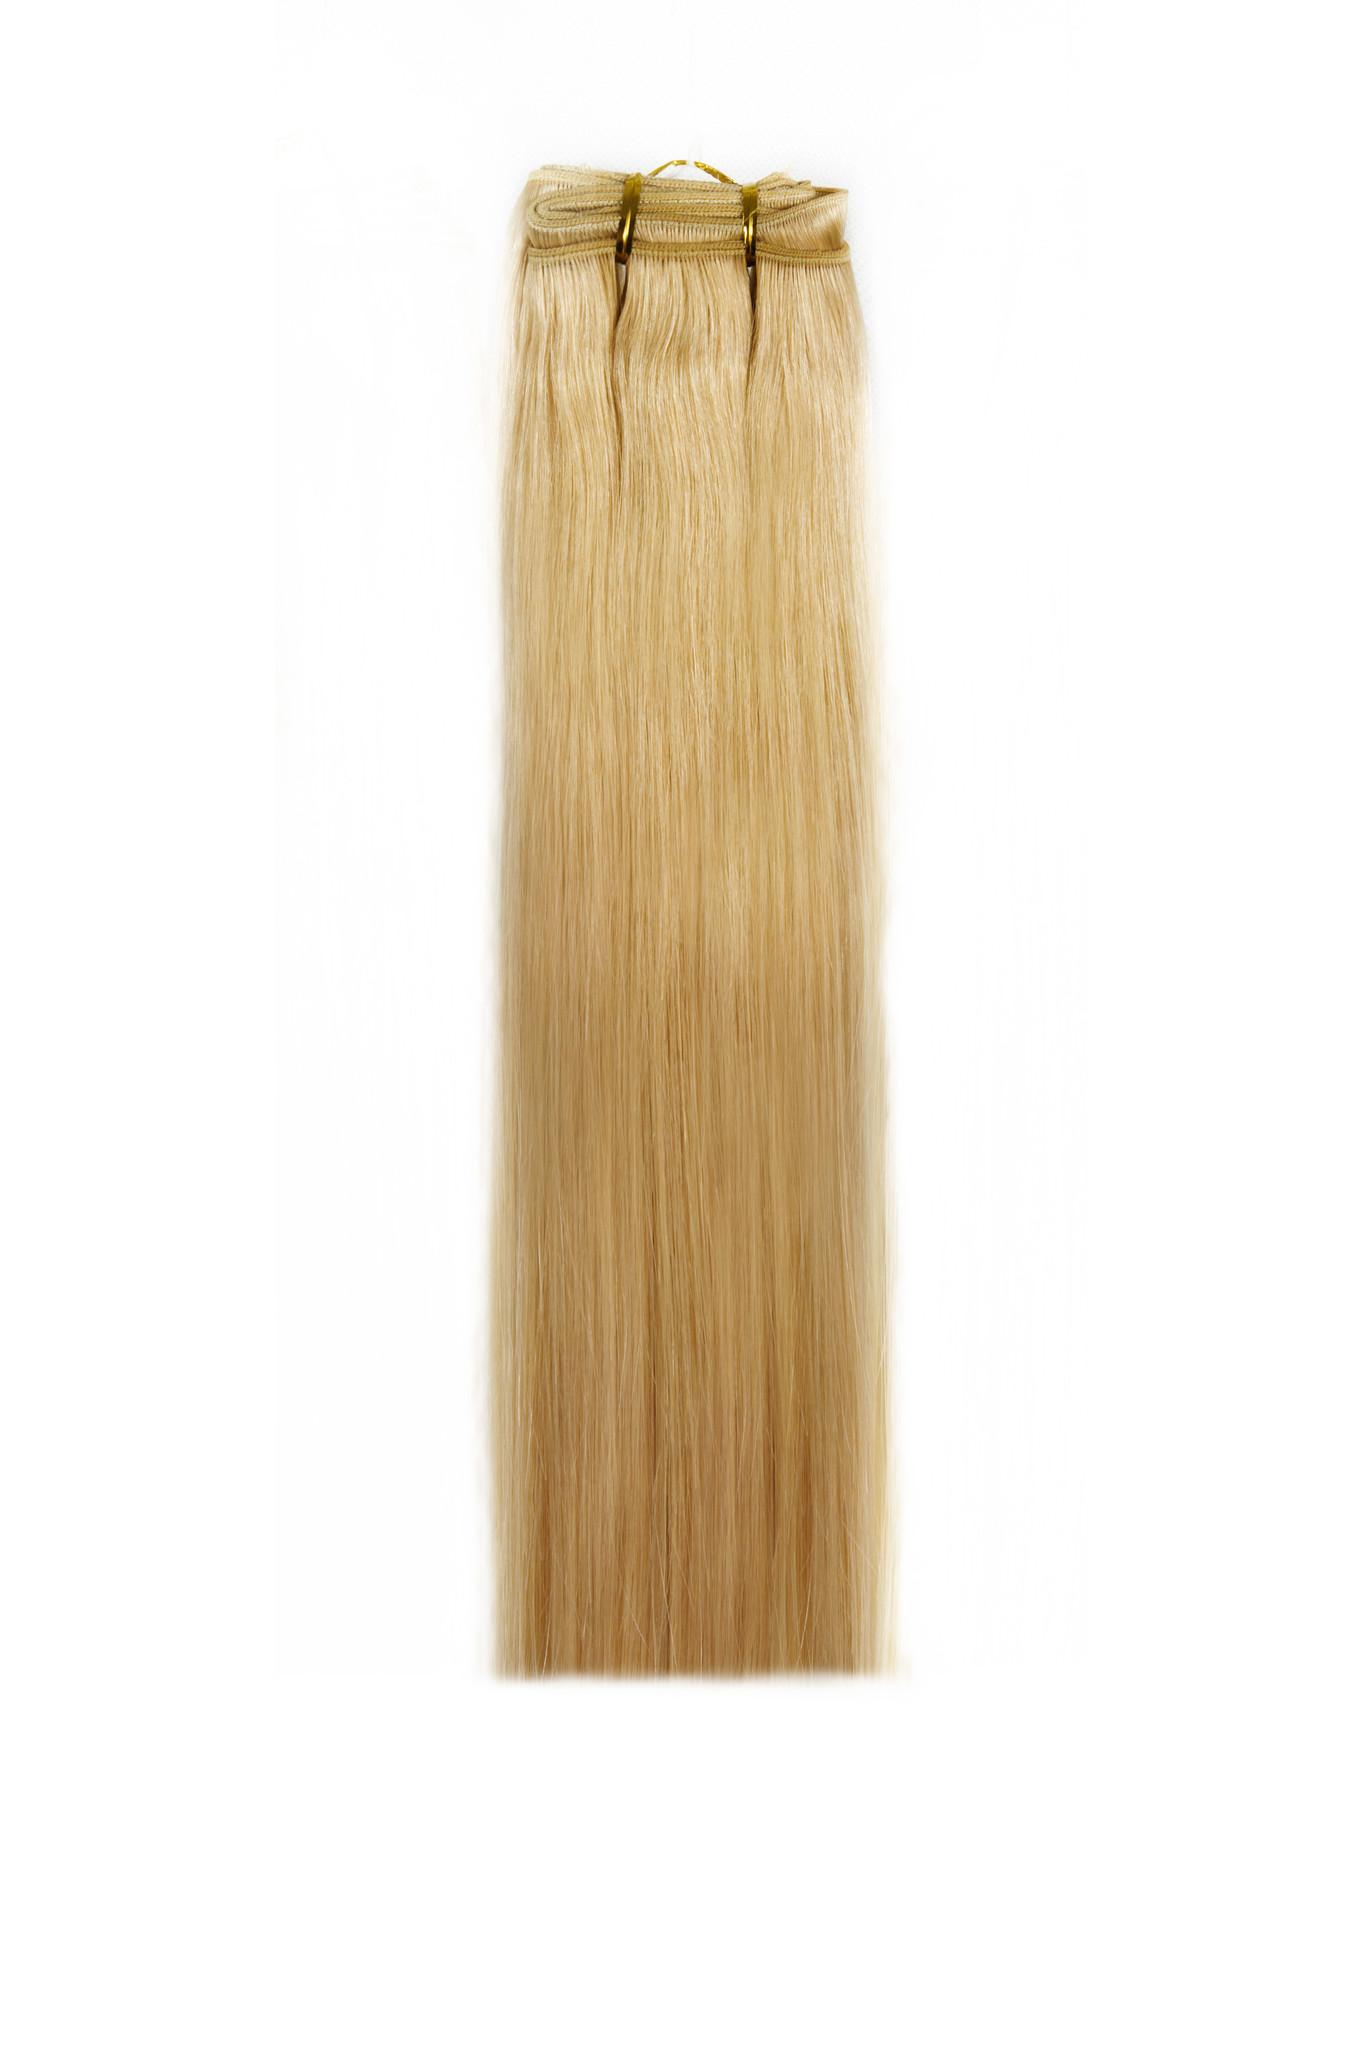 SilverFox Indian Shri Weave-#22 Hollywood Blonde